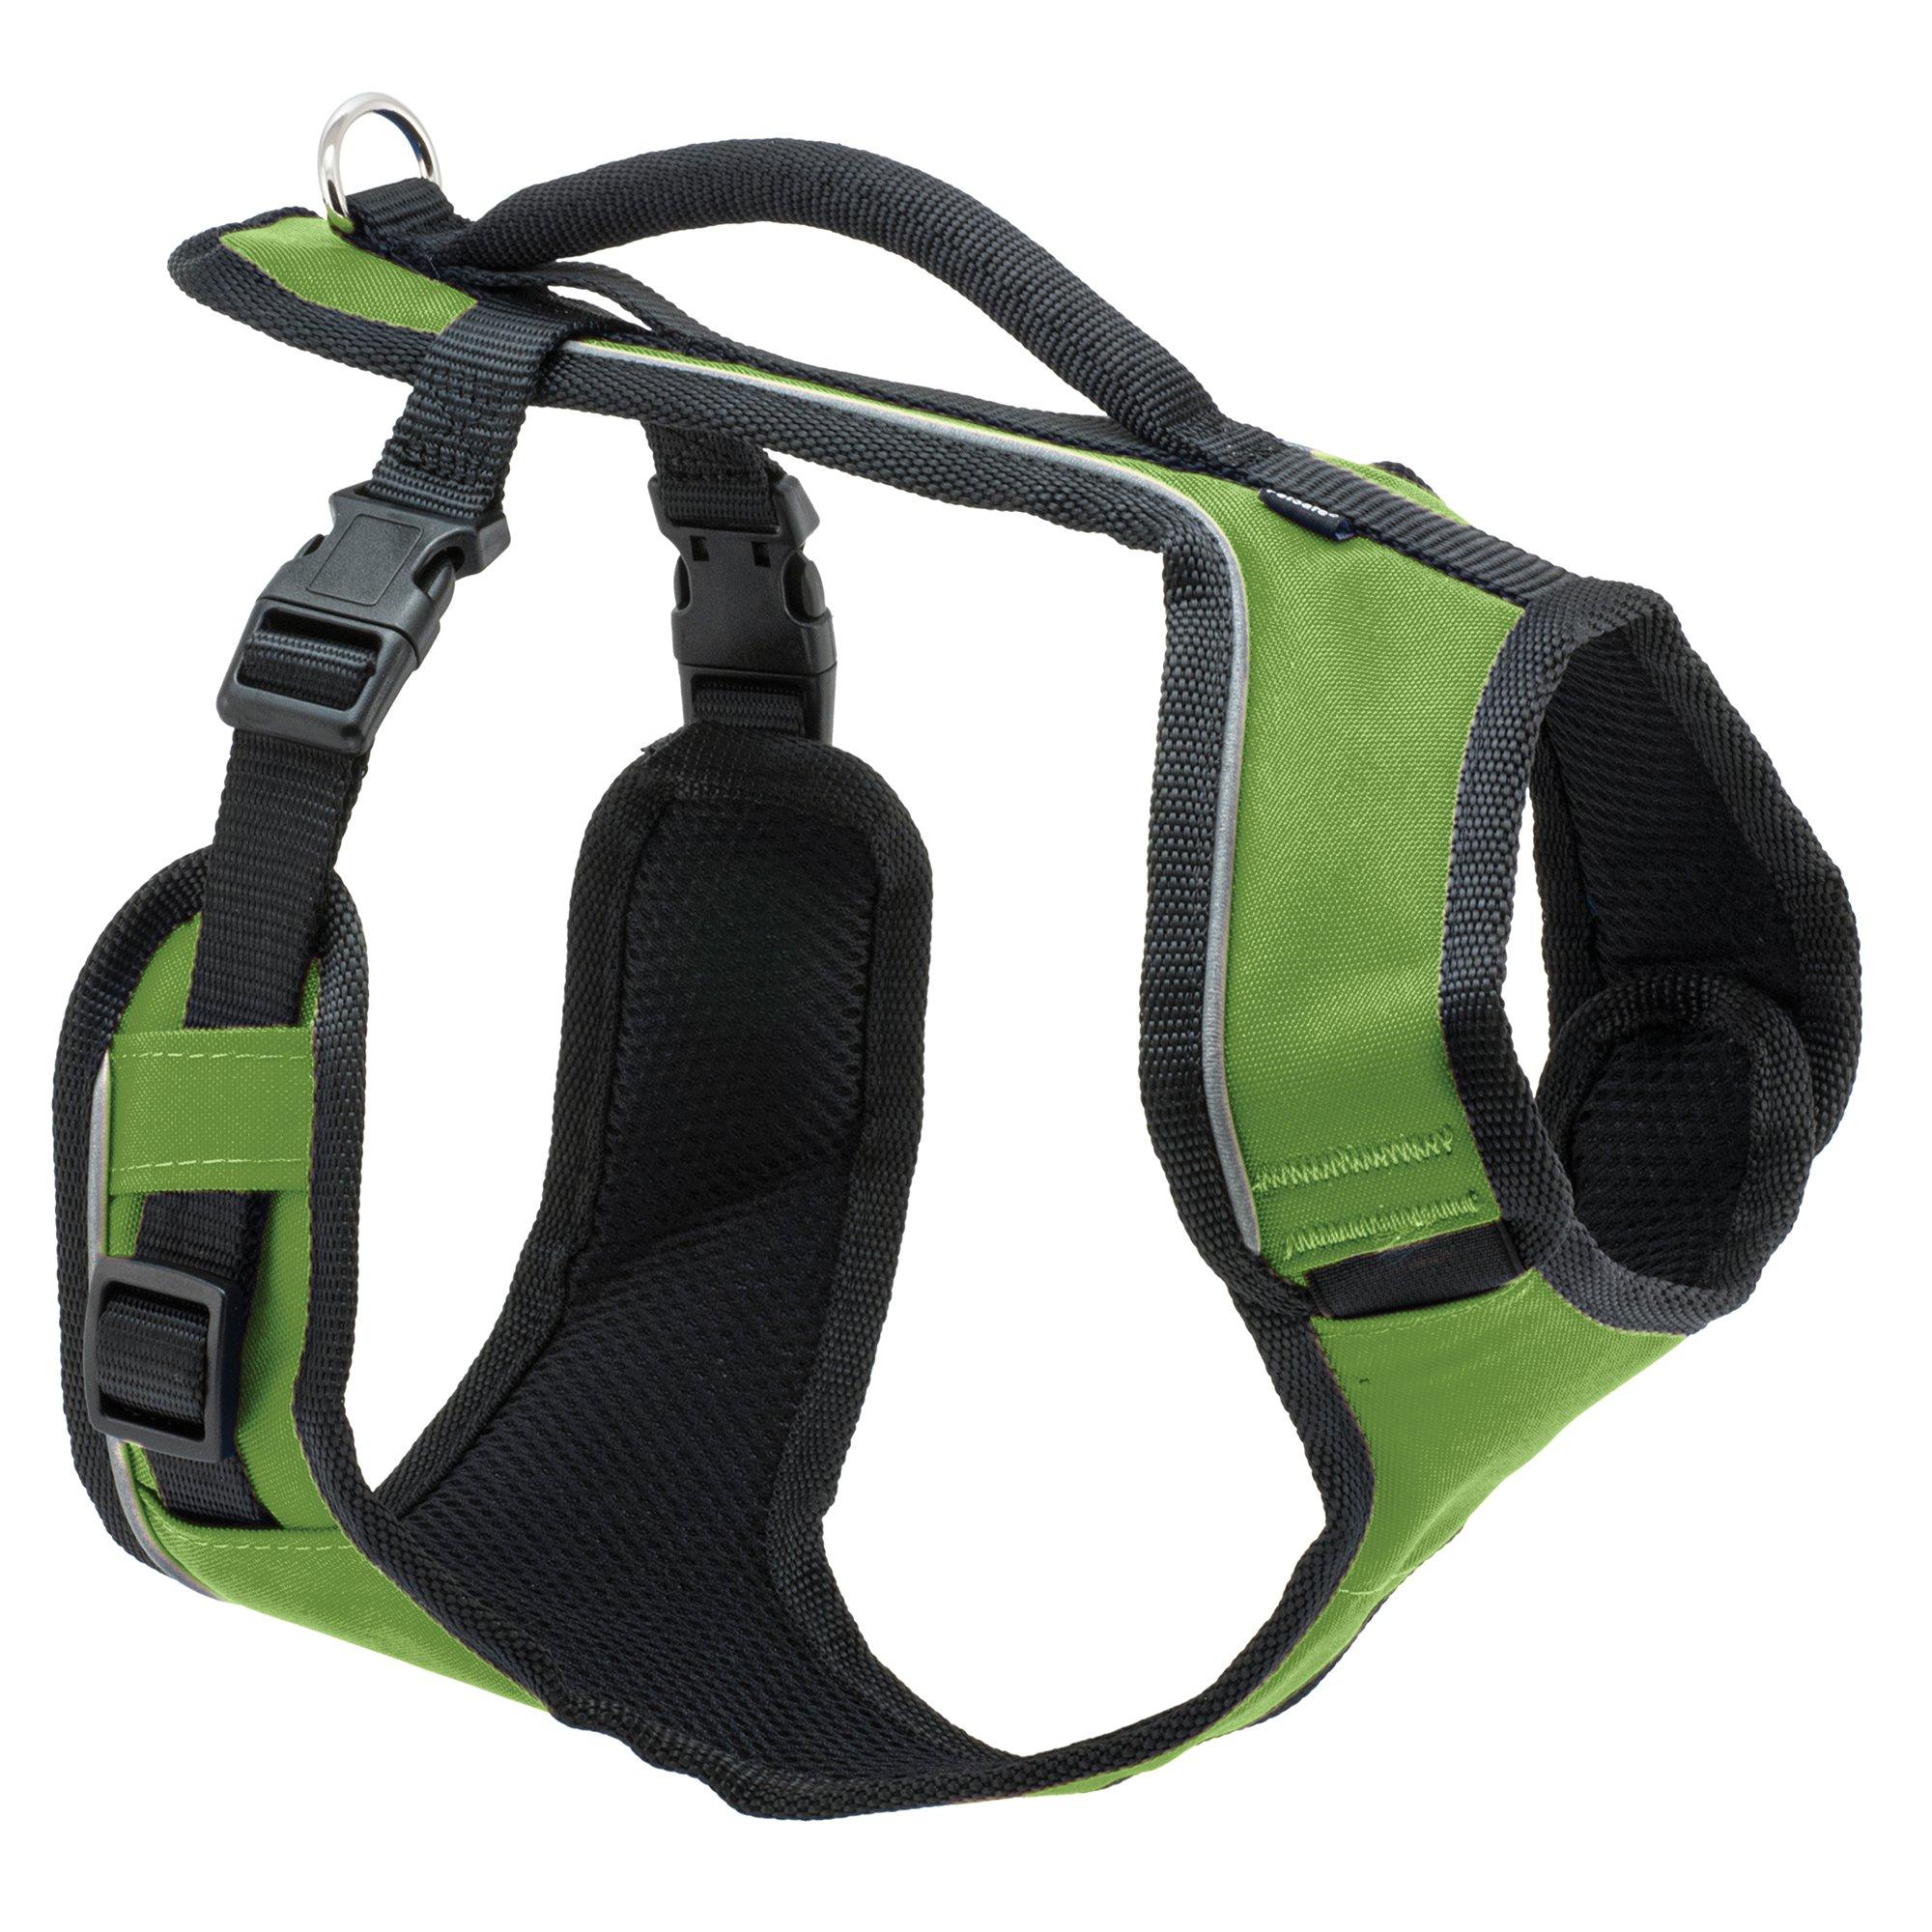 Petsafe Easysport Harness In Apple Large Petco In 2020 Easy Walk Harness Dog Harness Dog Training Pads